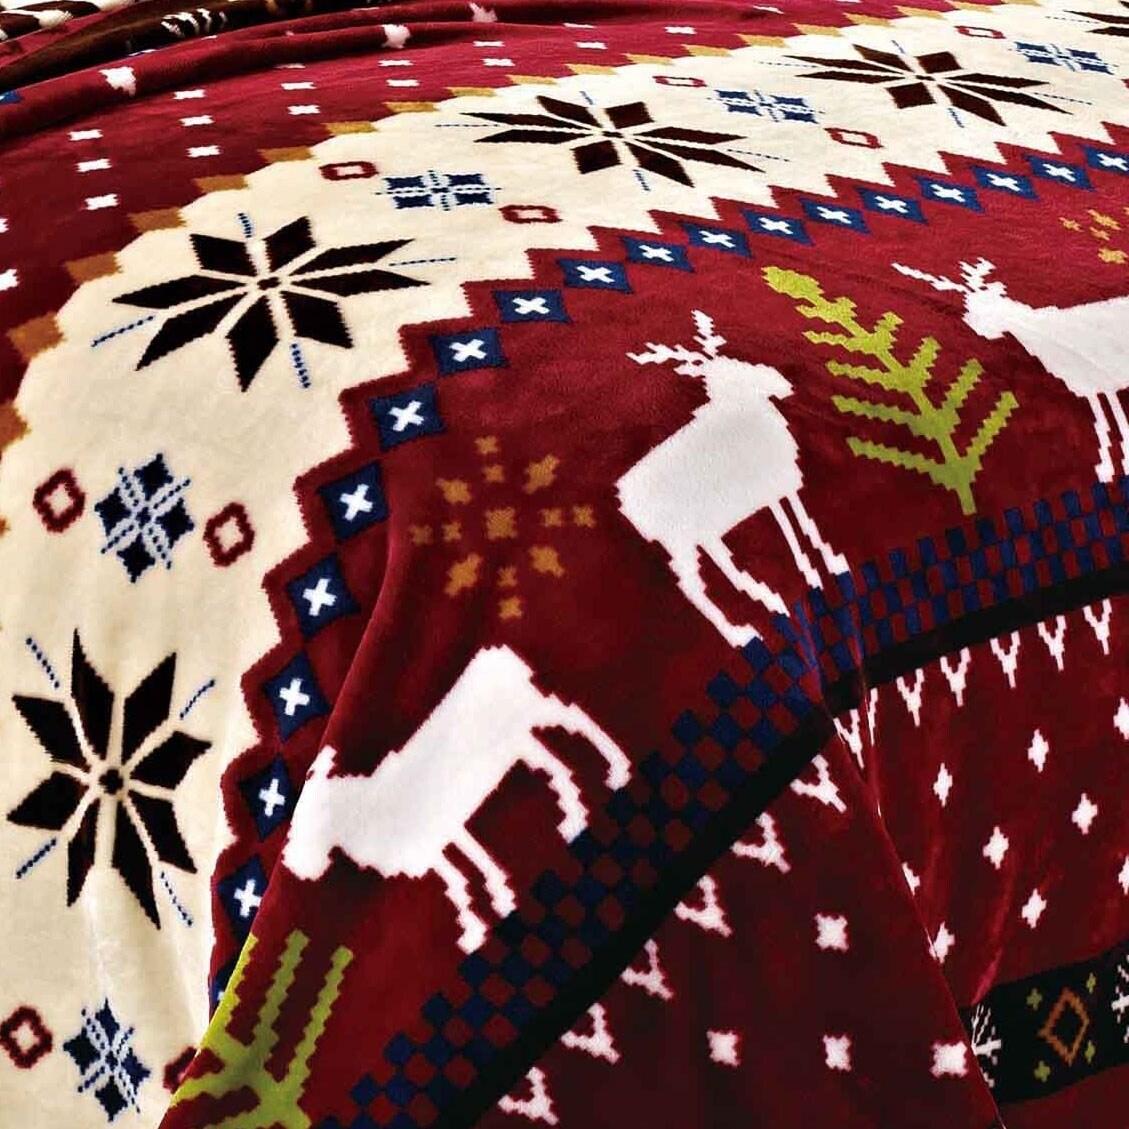 Christmas Fleece.Serenta Printed Christmas Flannel Fleece Blanket